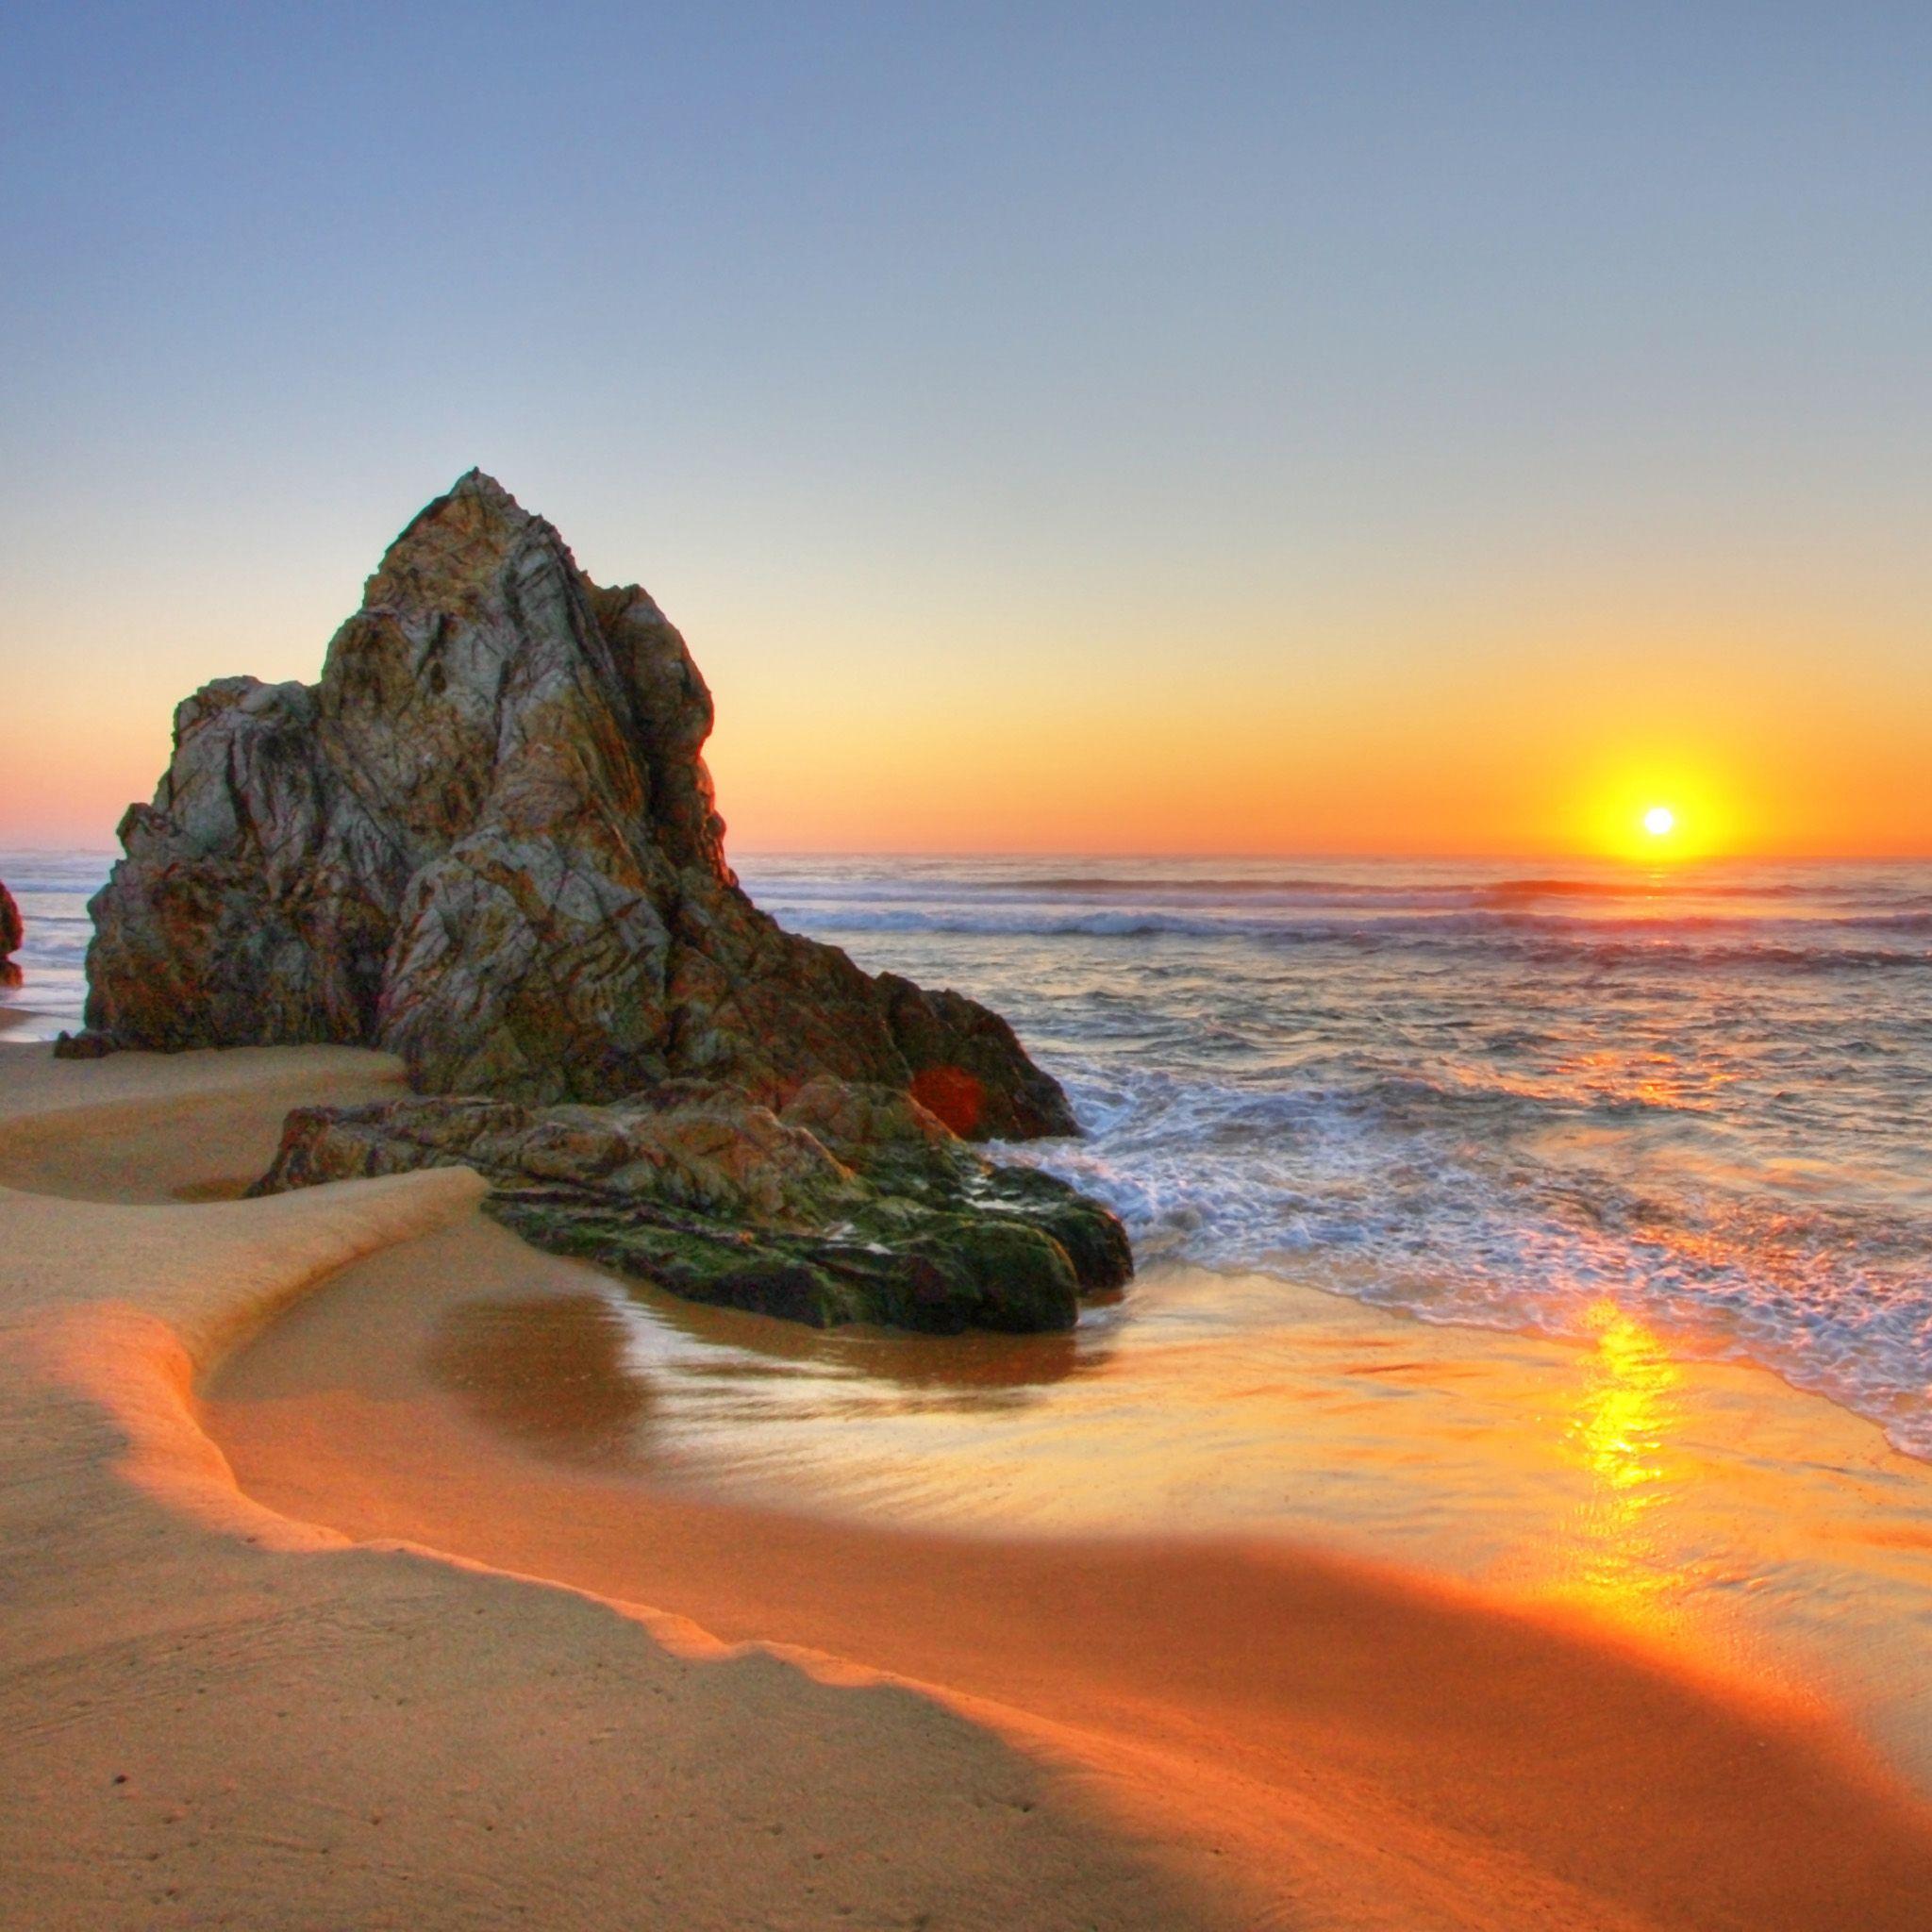 sunrise In Tathra, Australia in 2019 Canvas pictures